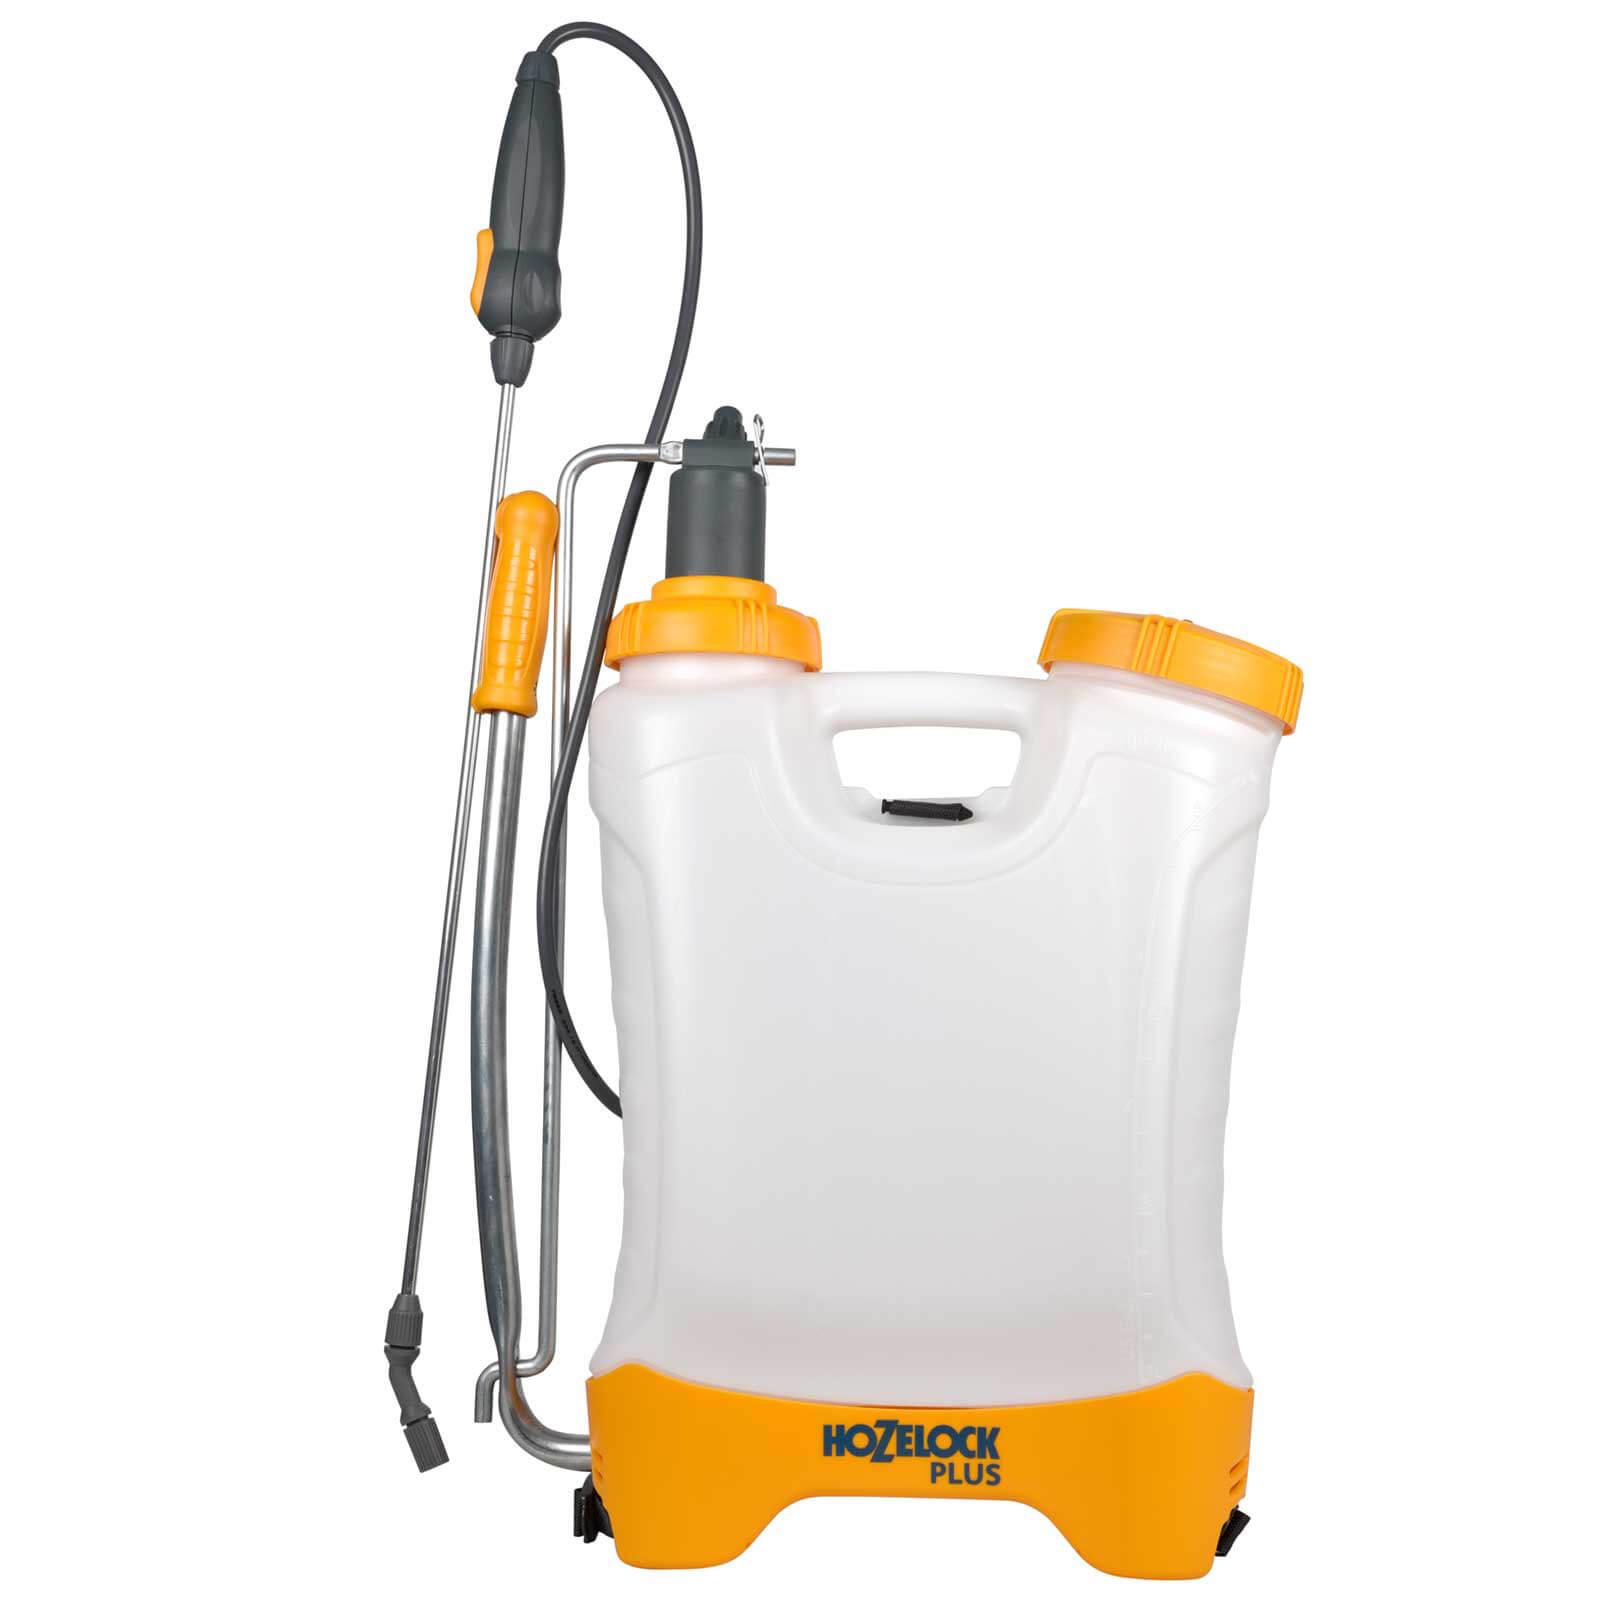 Hozelock PULSAR PLUS Comfort Knapsack Water Pressure Sprayer 16l